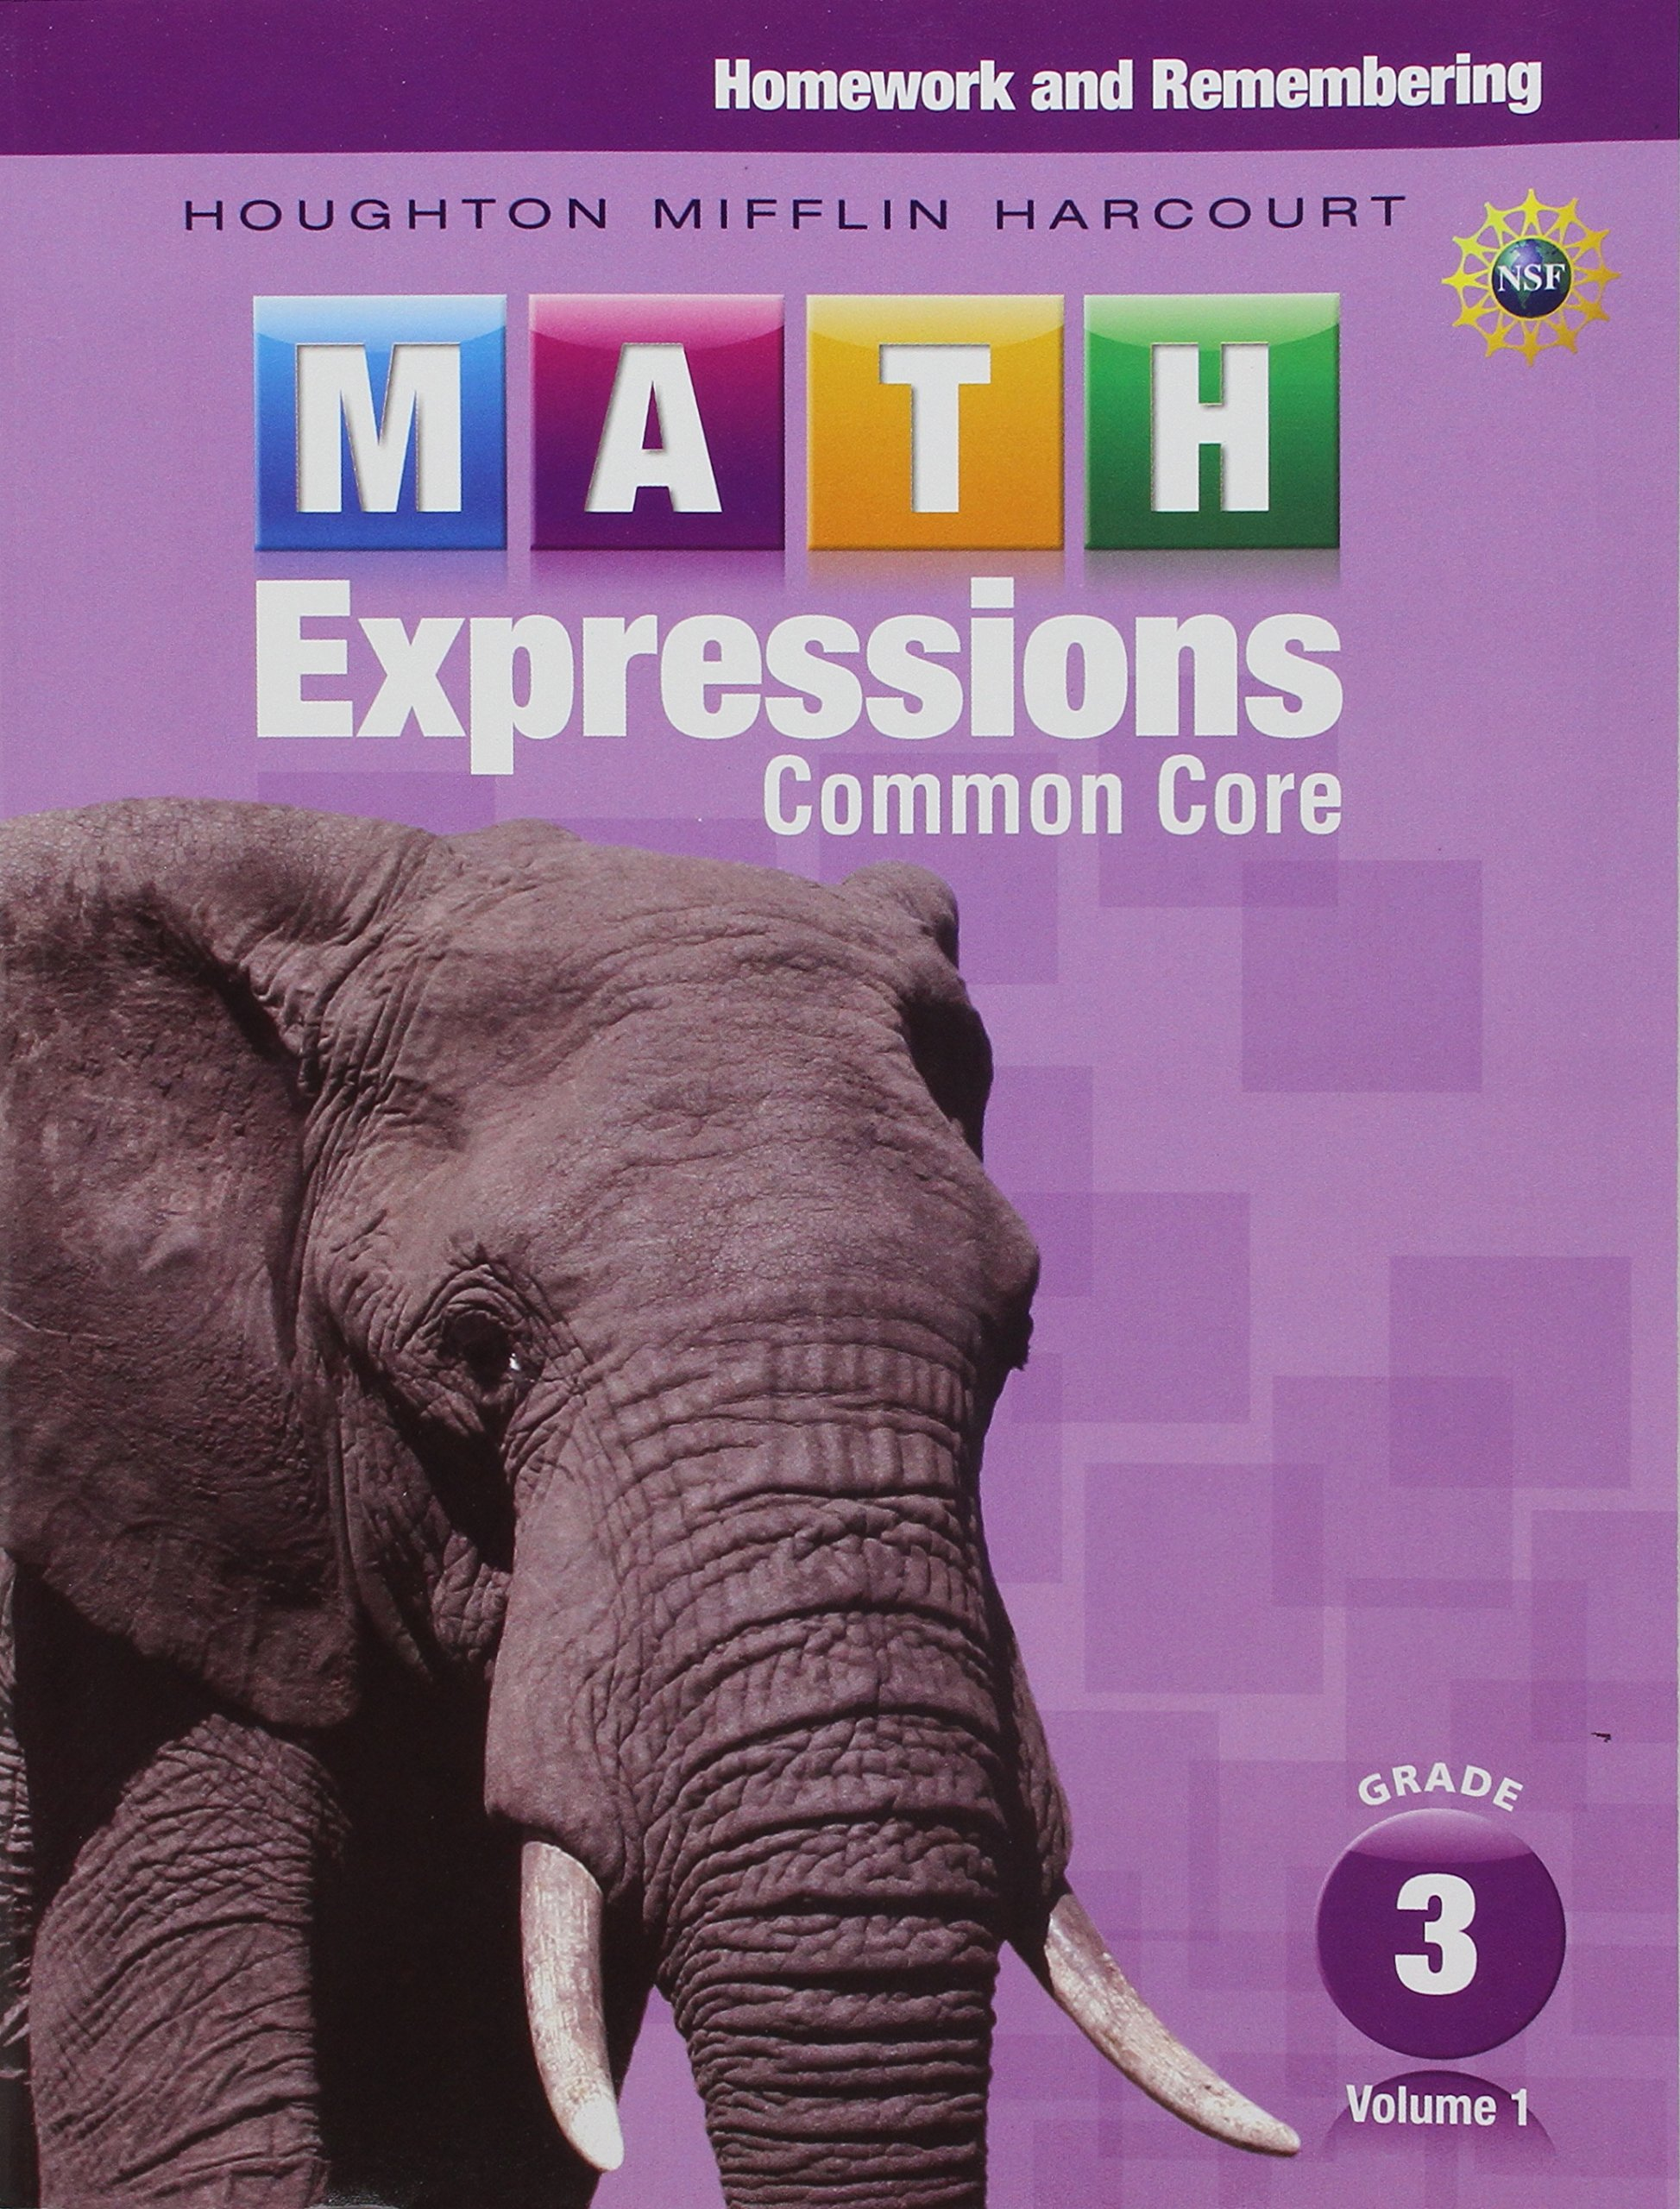 Homework Remembering Volume 1 Grade 3 Math Expressions Houghton Mifflin Harcourt 9780547824239 Amazon Com Books